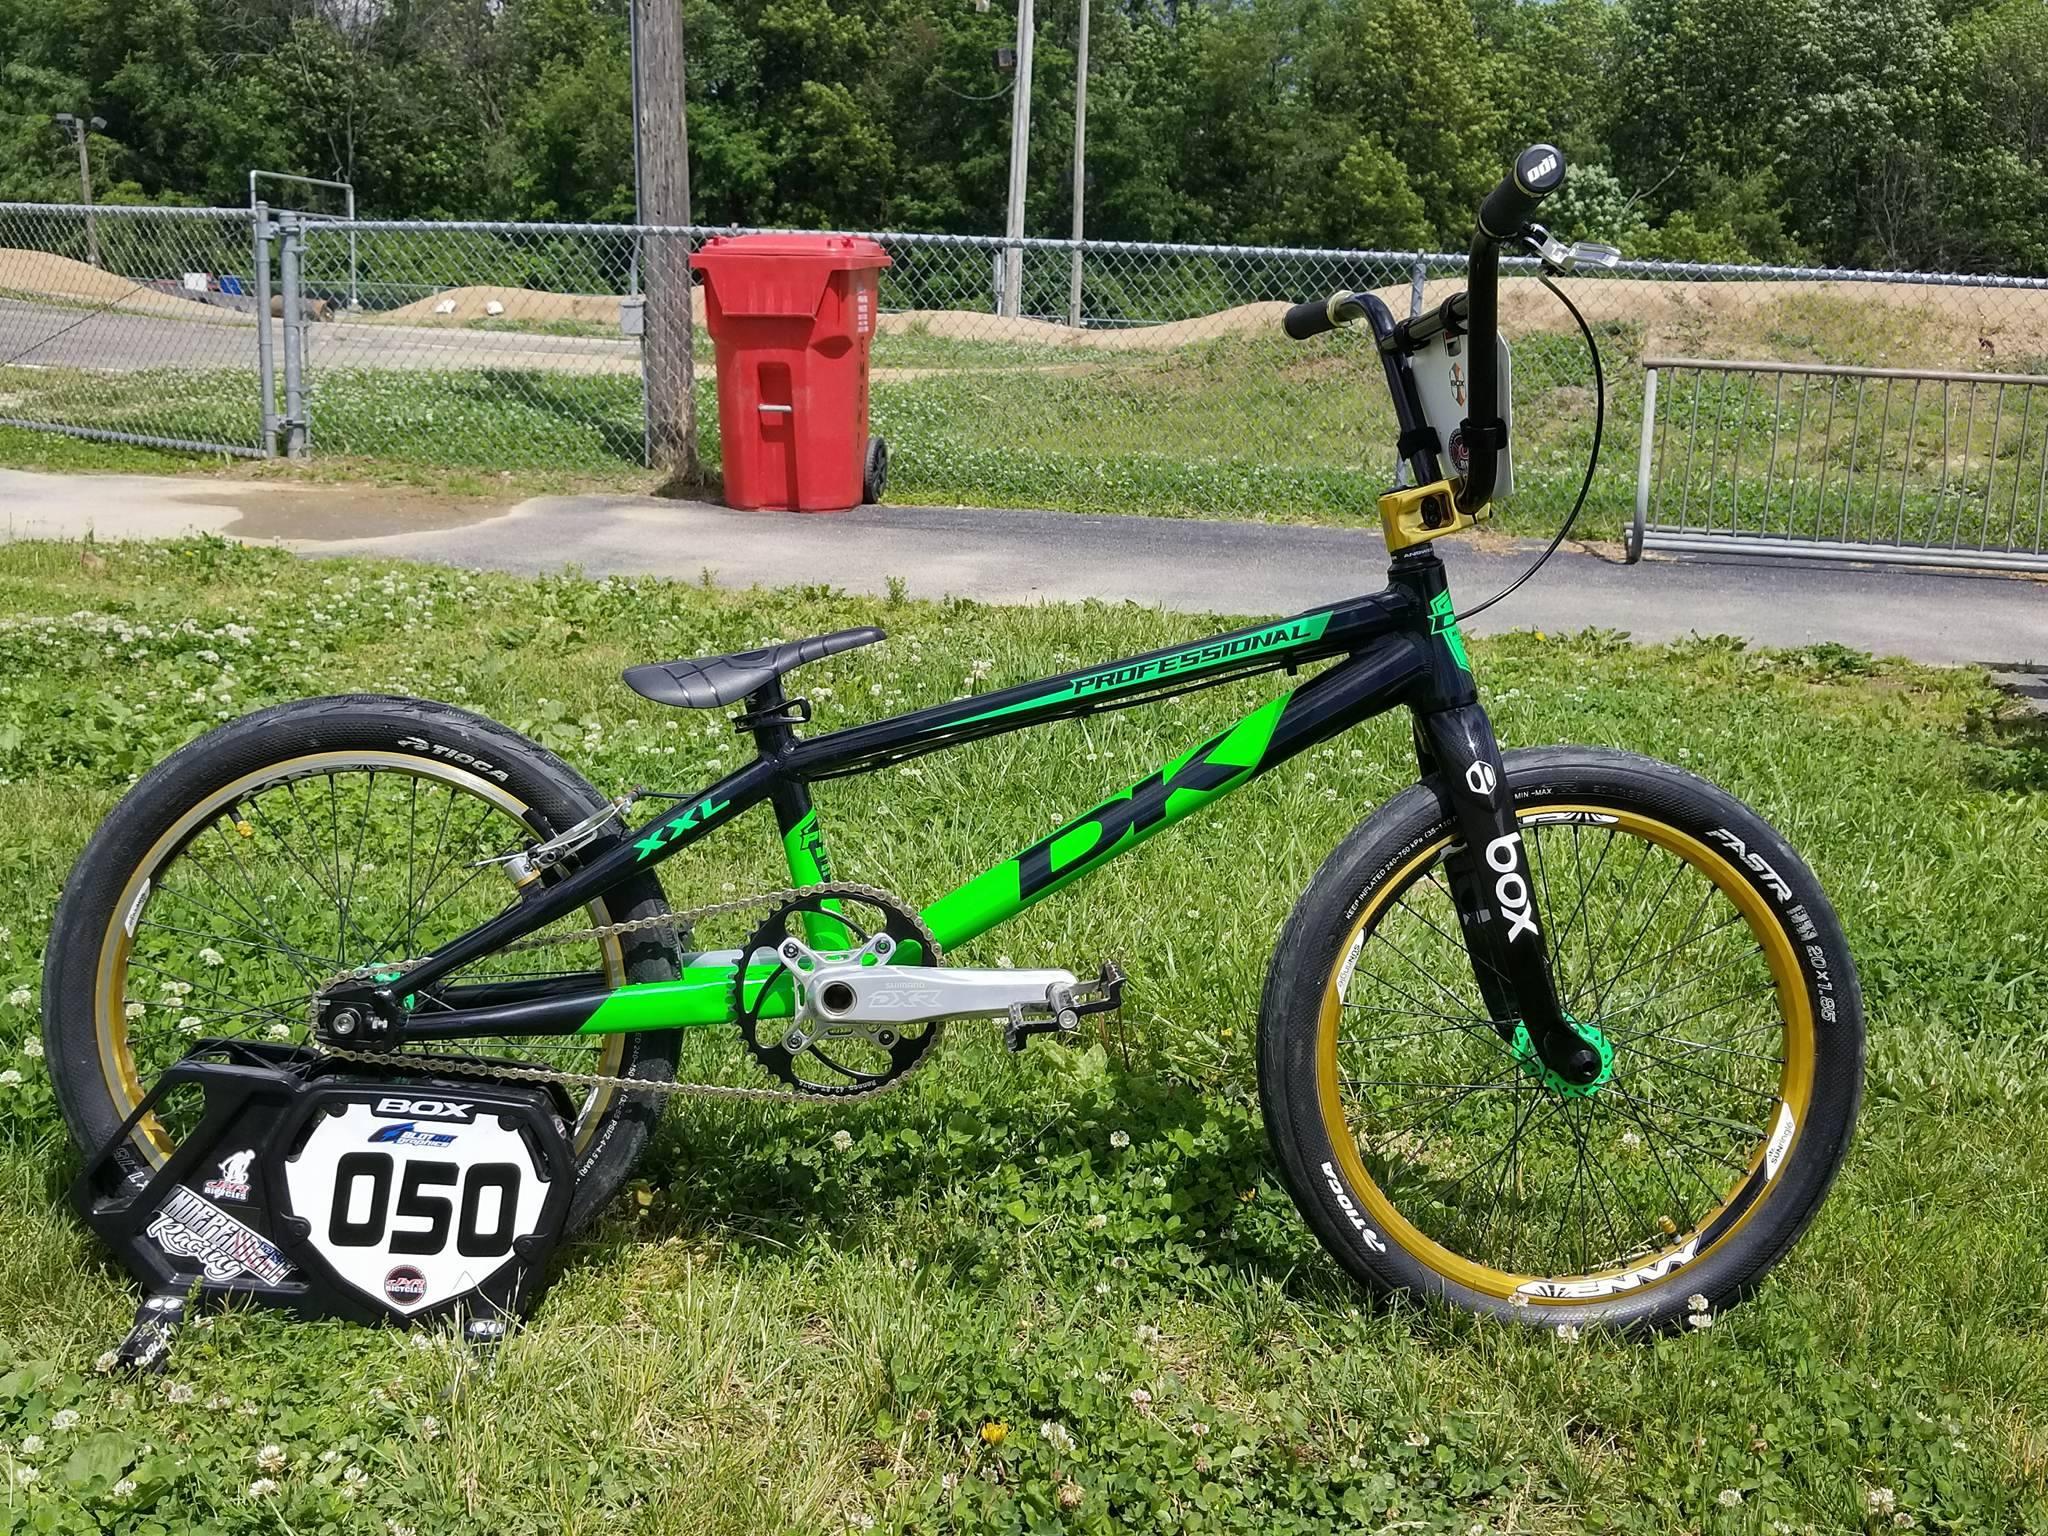 Bike Of The Day: 2017 DK Professional XXL - Sugar Cayne